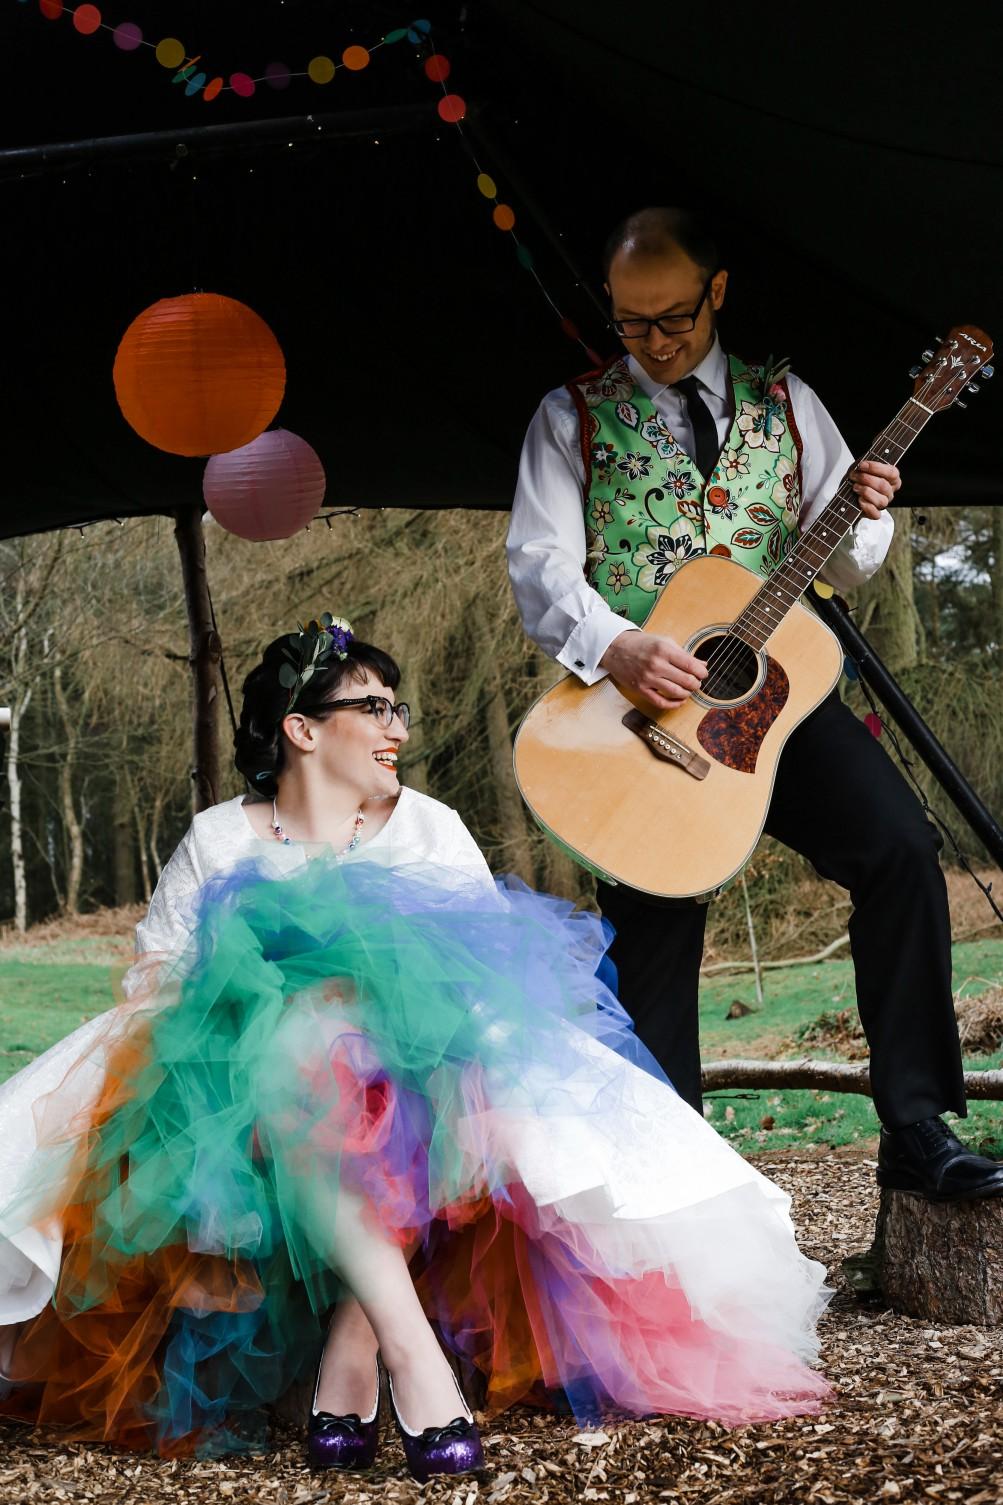 Becky Payne Photographer - Rainbow Unicorn Styled Wedding Shoot - Guitar - Serenade